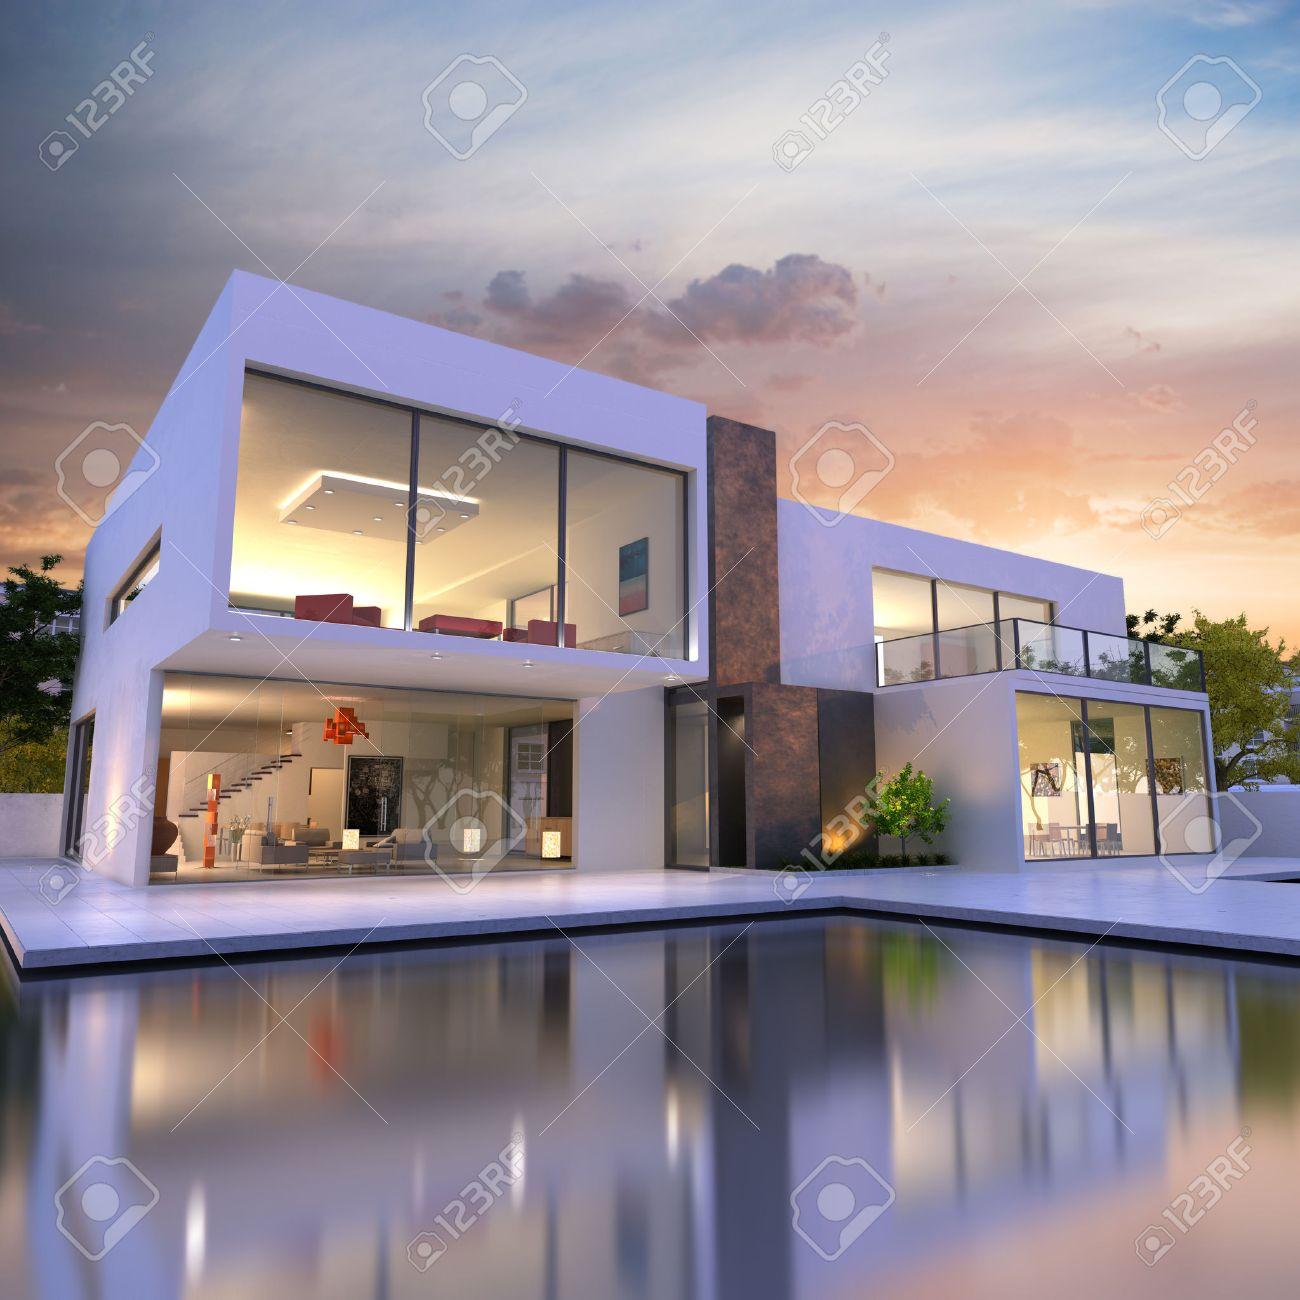 spesso Interni Di Ville Di Lusso. Top Interni Ville Moderne Interni Case  JY03